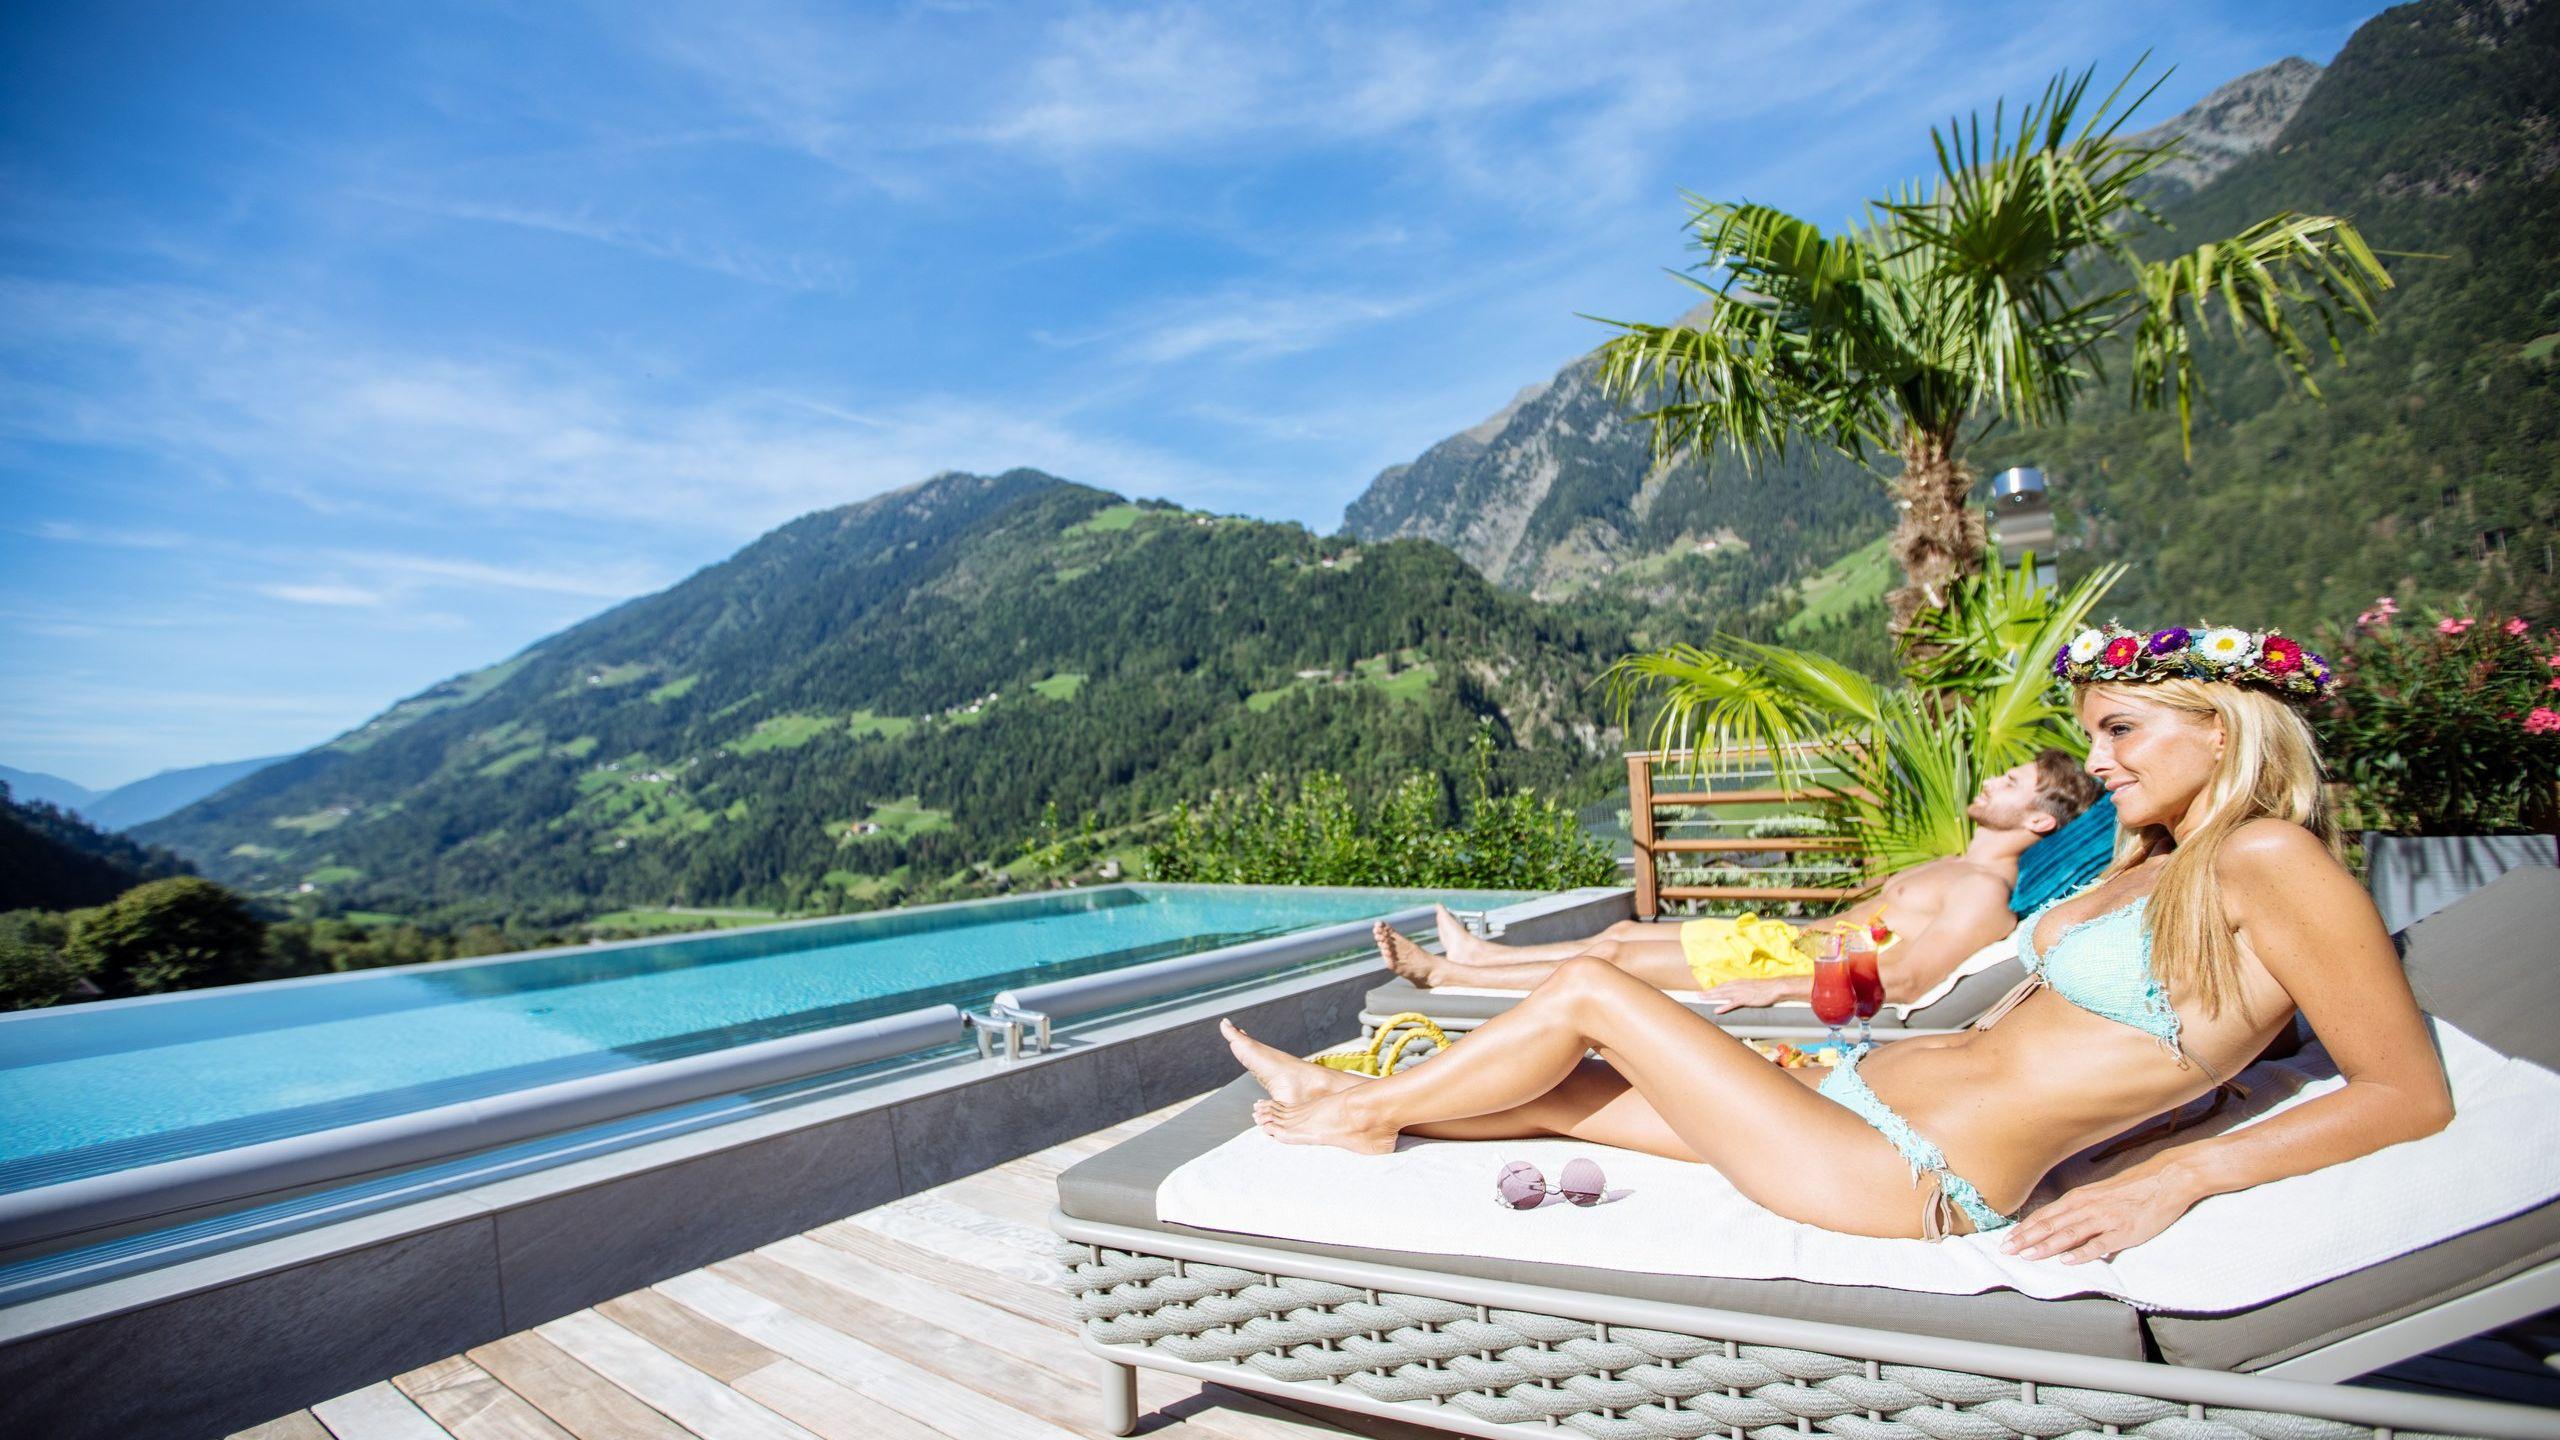 5 Sterne Wellnesshotels In S Dtirol Mit Stil Andreus